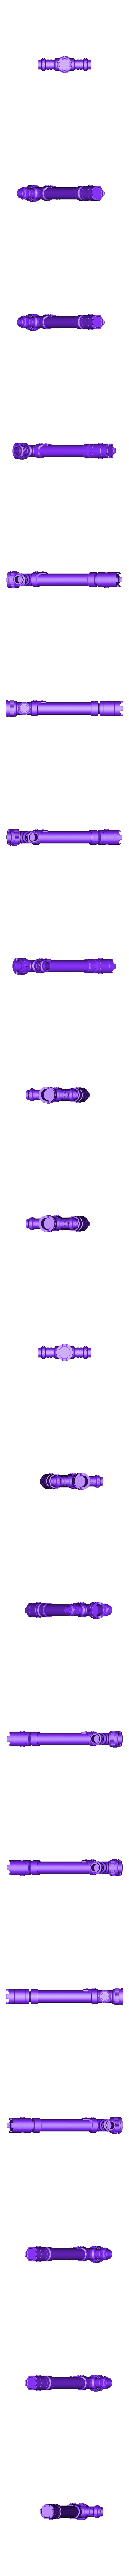 Star Wars VII The Force Awakens Kylo Ren Sword Cosplay Weapon Prop - Lightless_stl_Äåòàëü1_1.stl Download OBJ file Star Wars VII The Force Awakens Kylo Ren Sword Cosplay Prop • 3D printer object, Blackeveryday